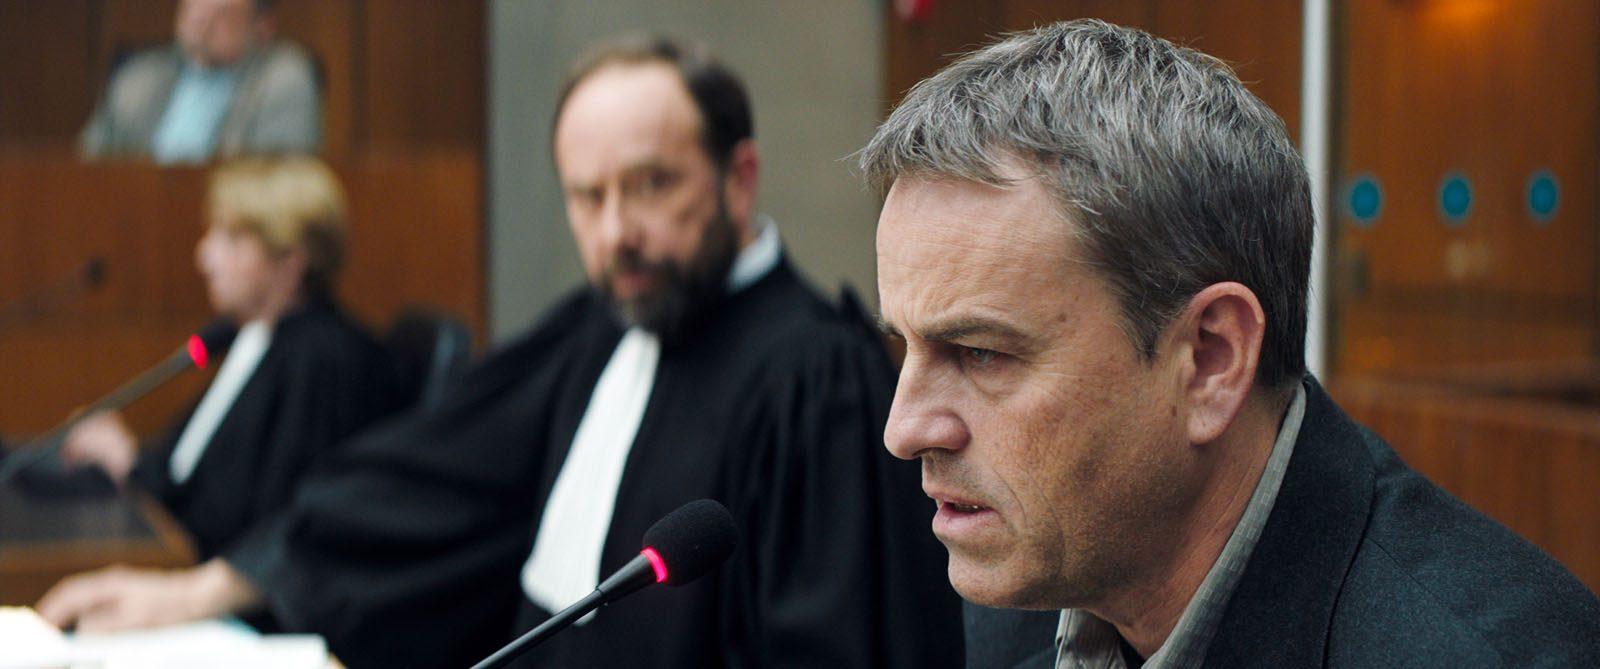 Une Intime conviction d'Antoine Raimbault